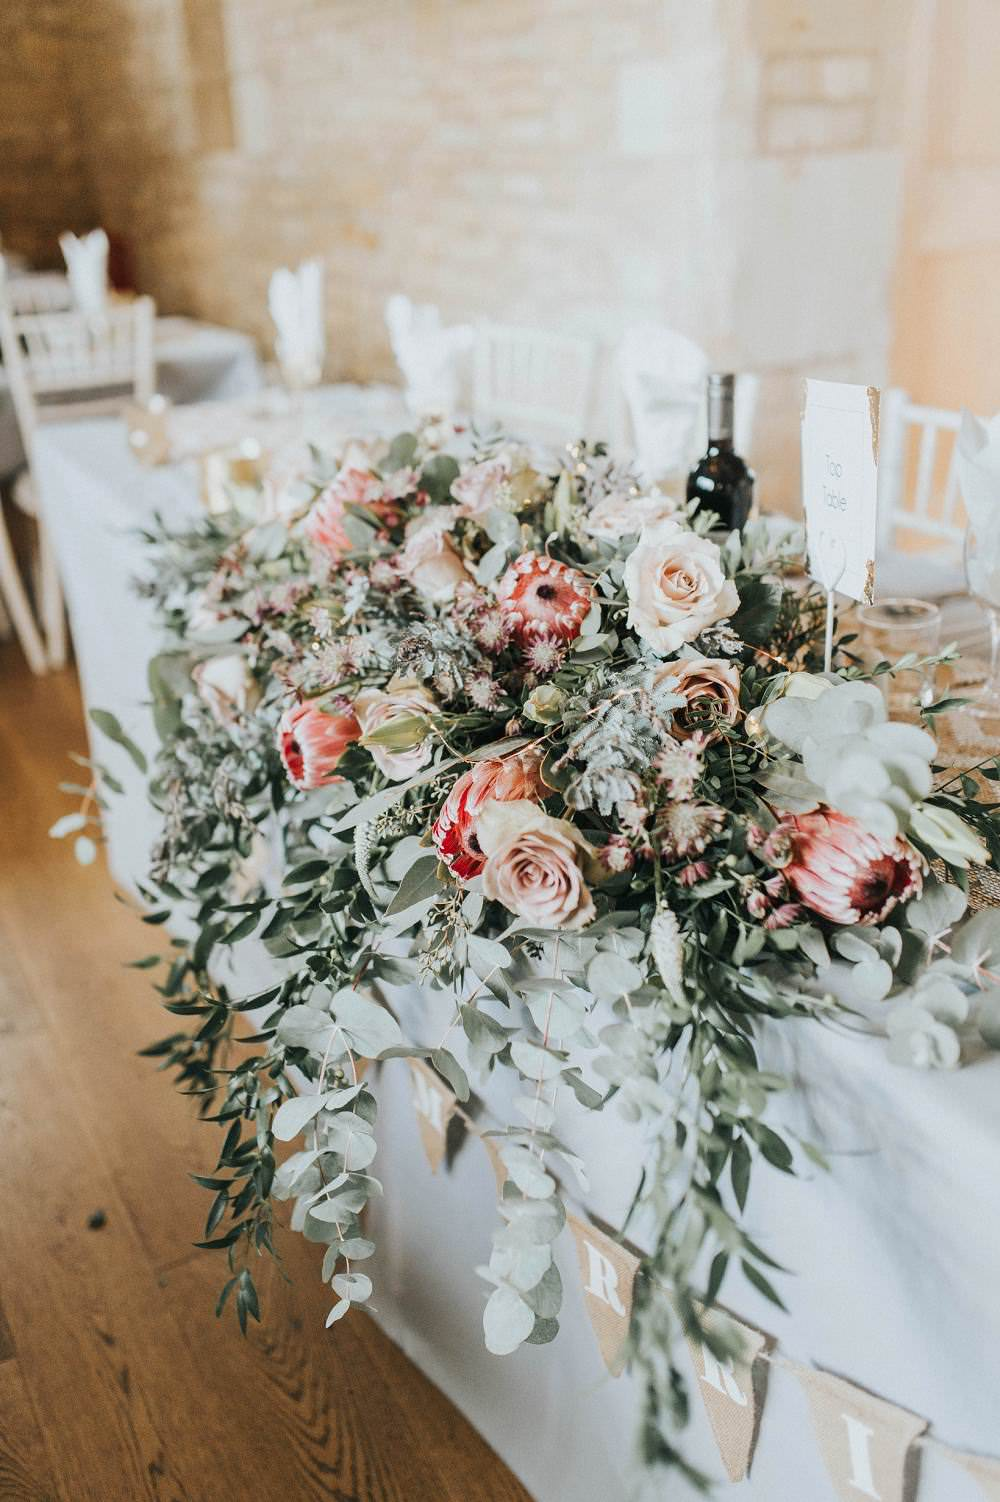 Top Table Flowers Foliage Rose Protea Pink Wild Eucalyptus Boho Greenery Barn Wedding Kerry Diamond Photography